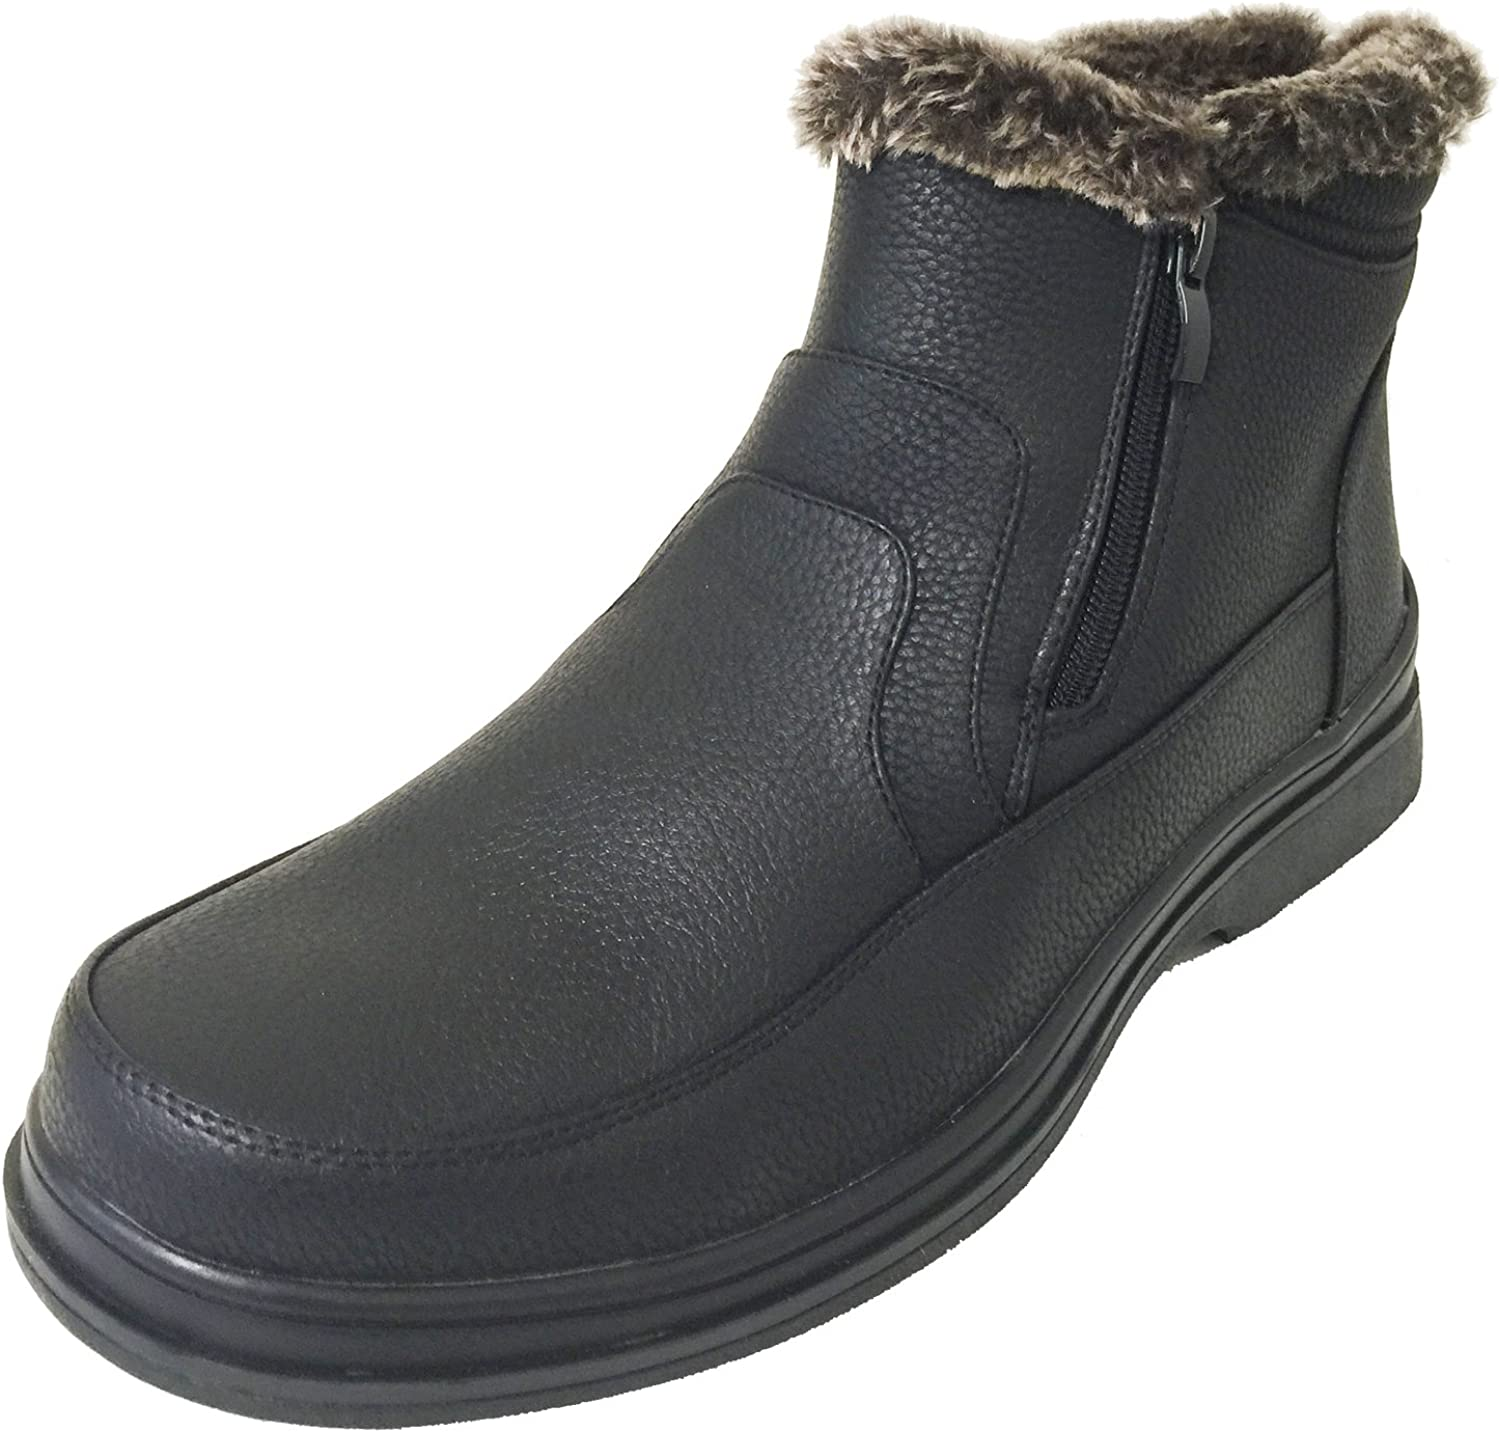 Brixton Mens Rusi 02 Fur Lined Winter Snow Boots